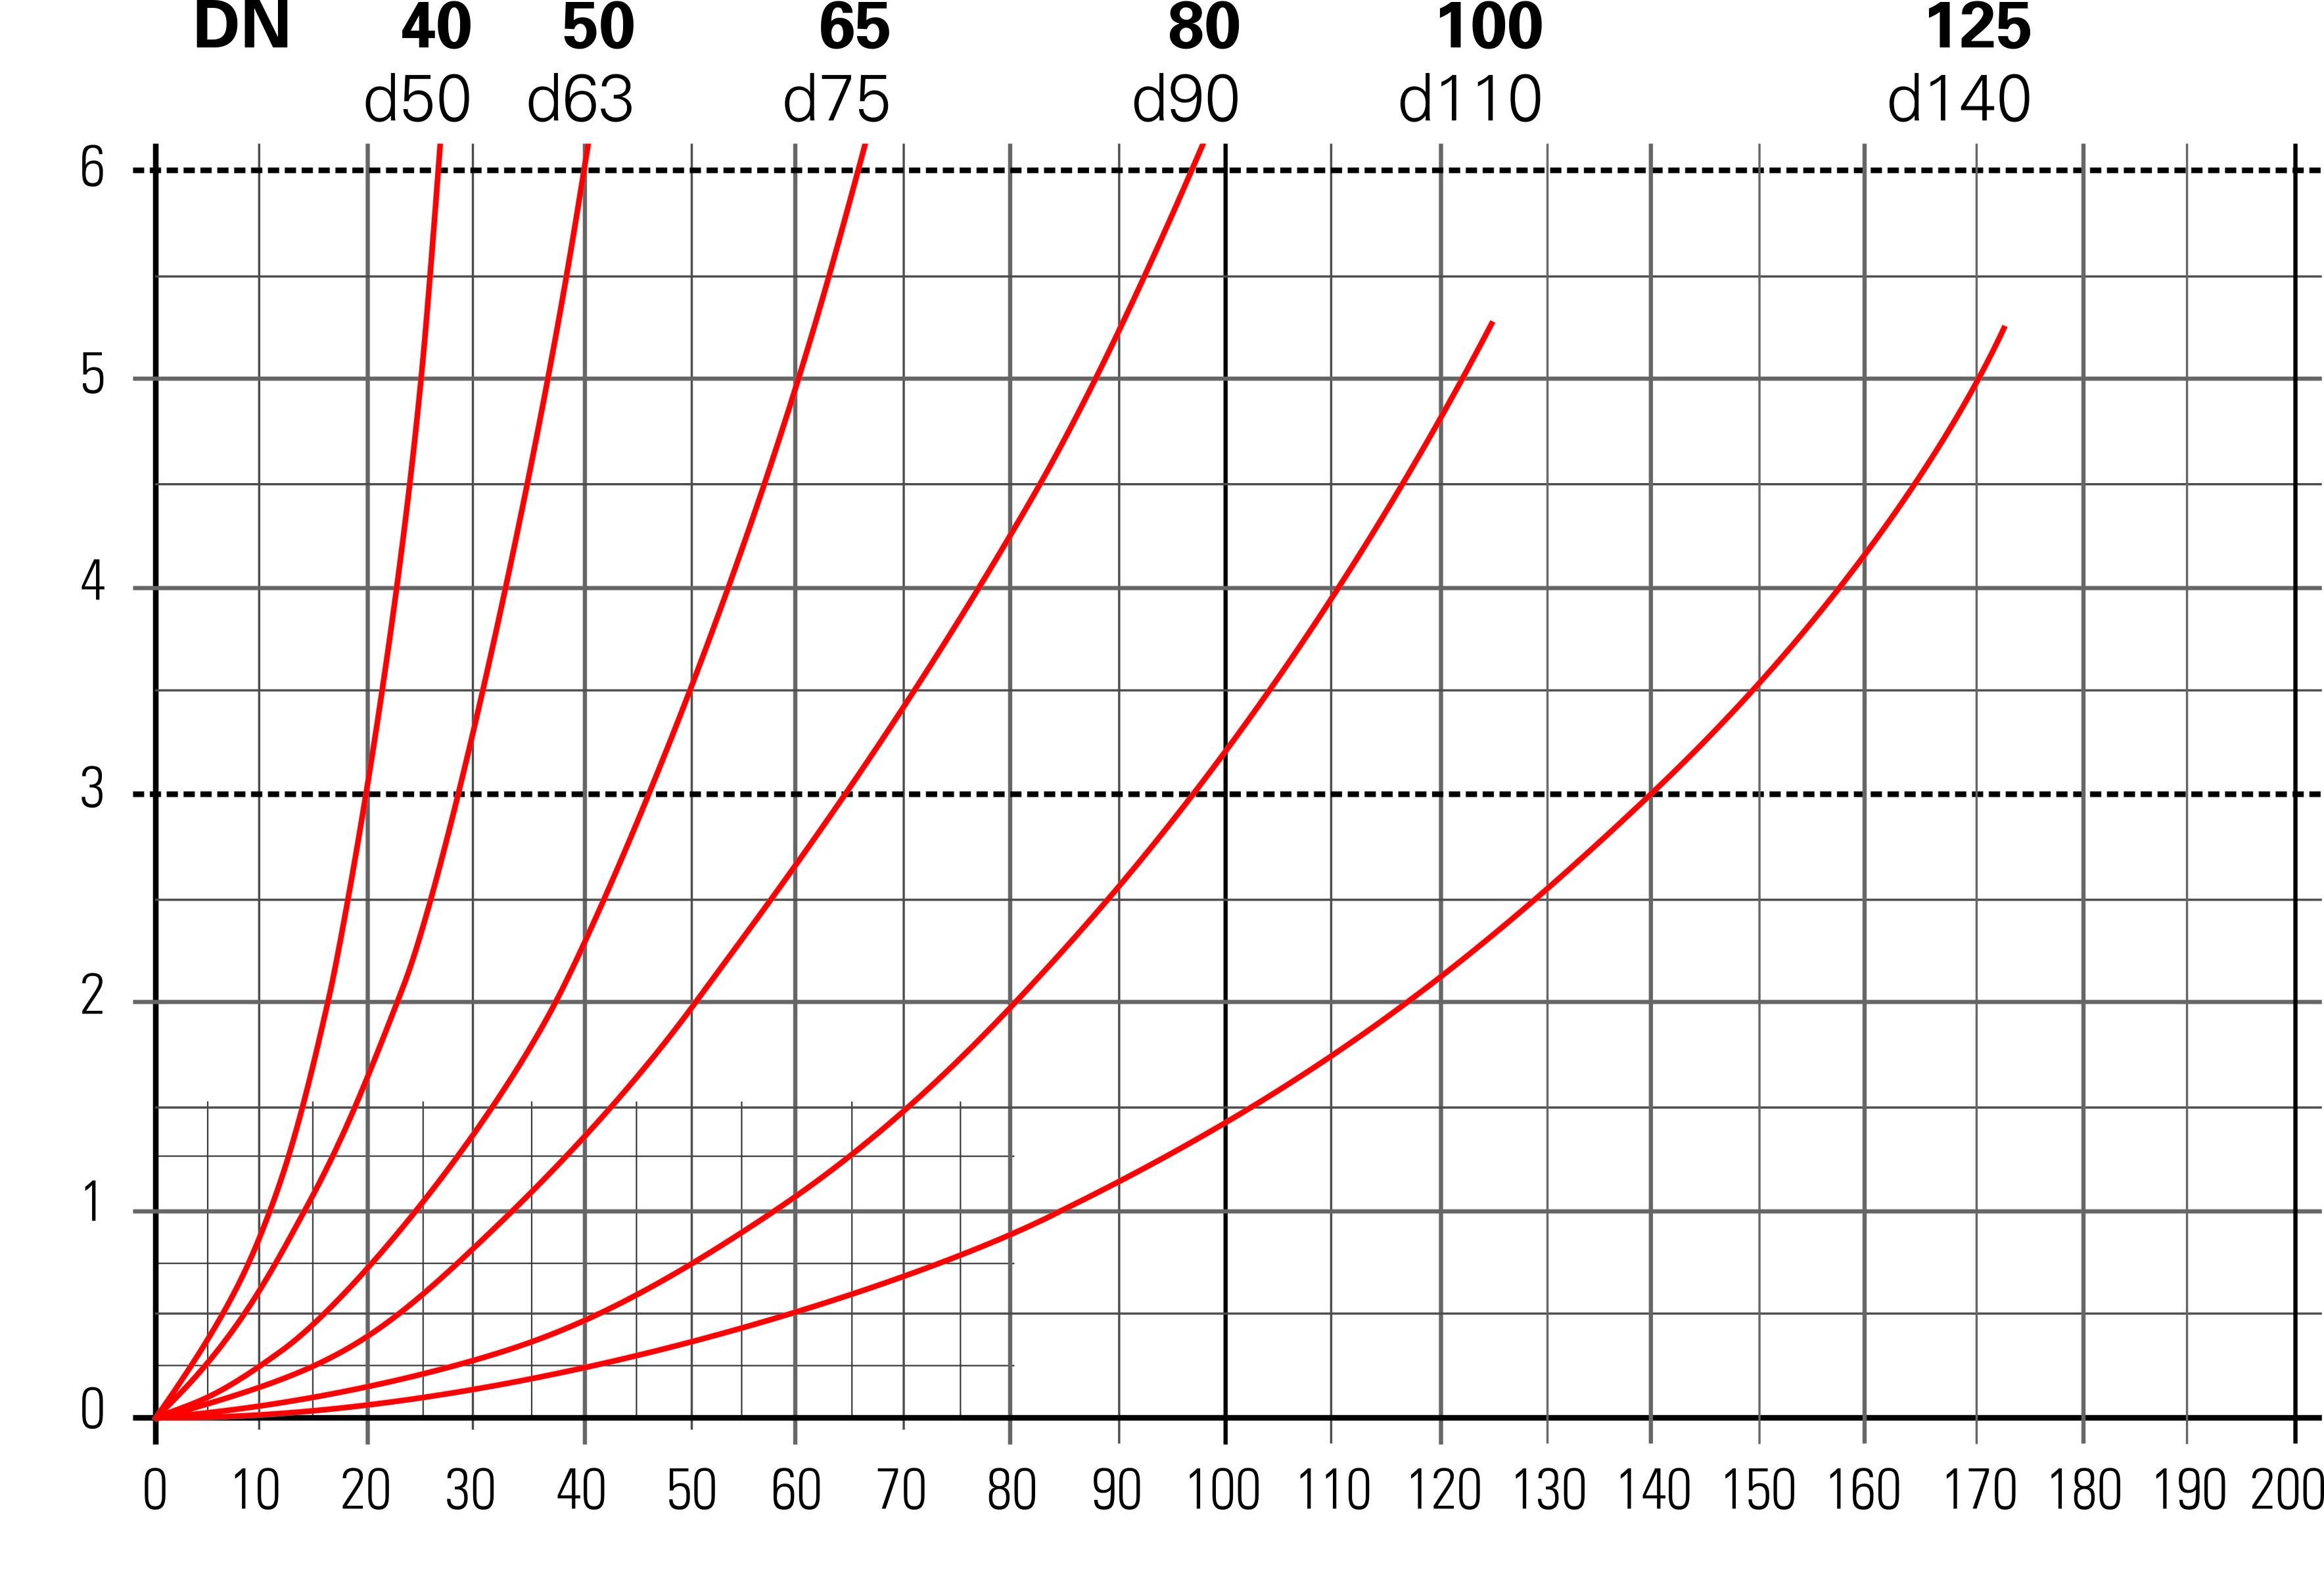 Besgo 5-way valves - Pressure loss data